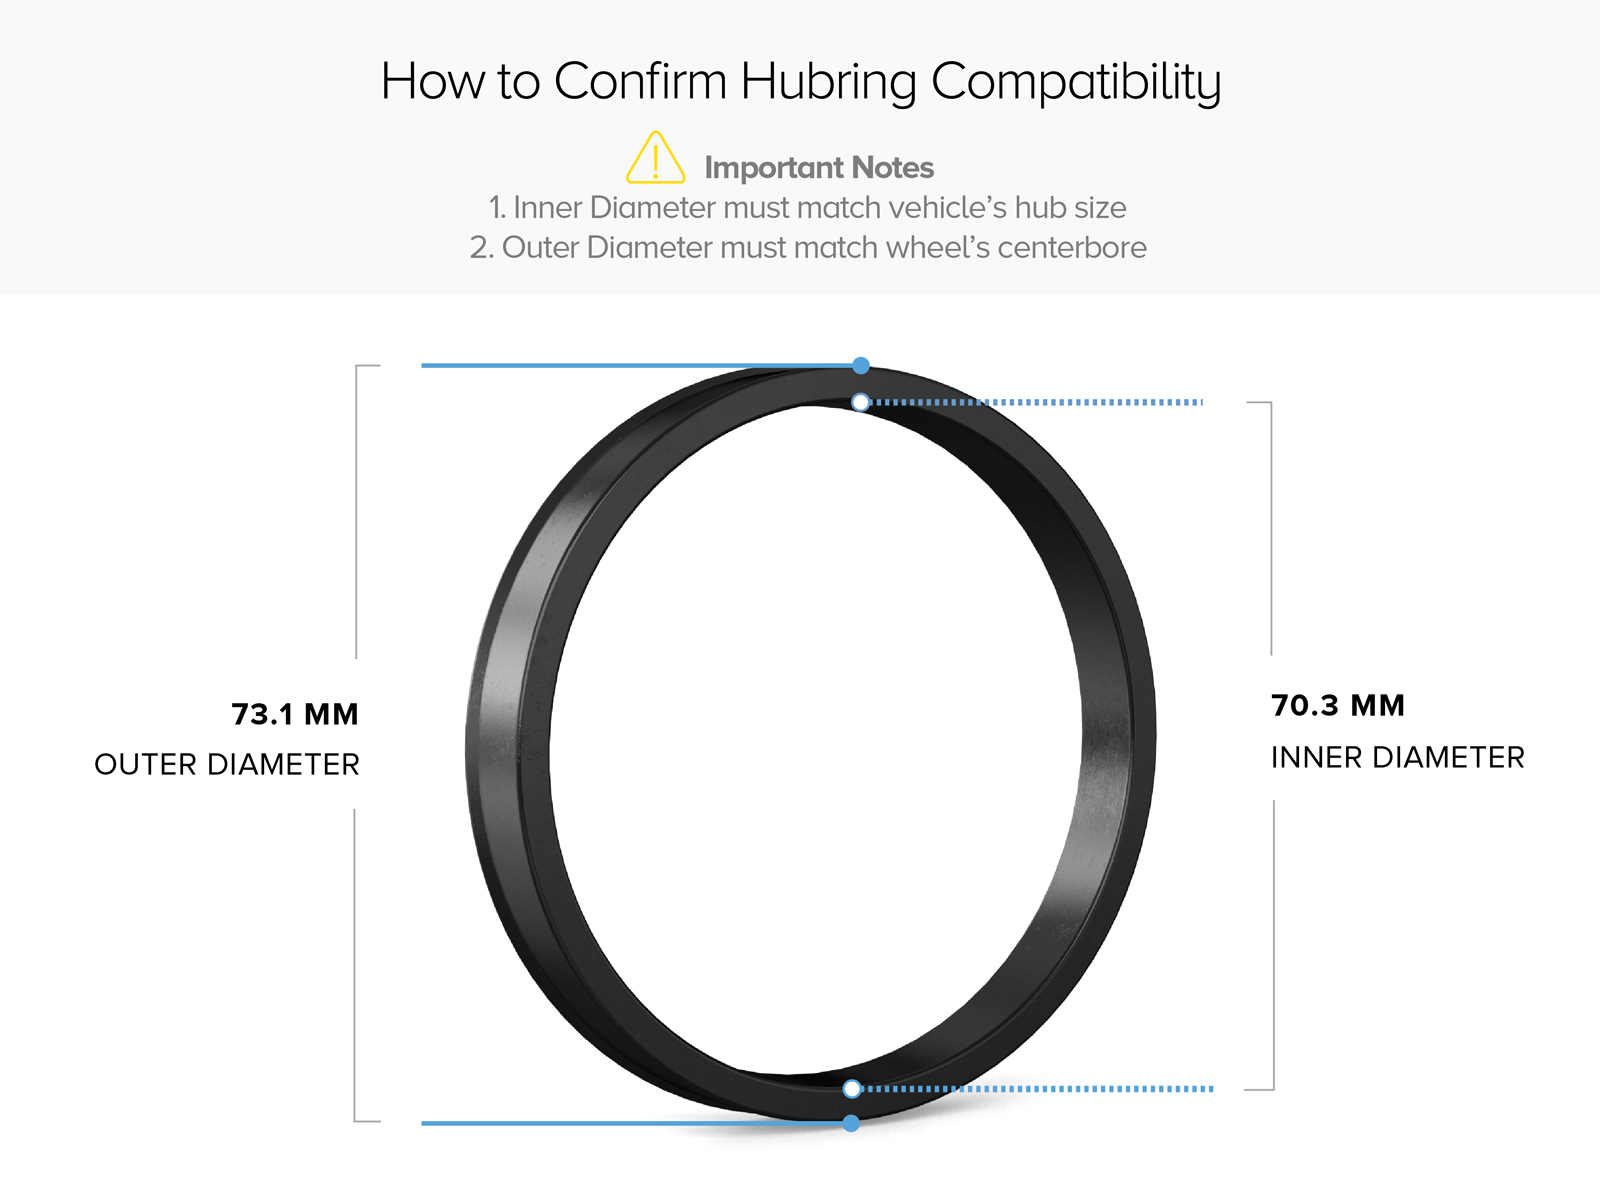 4pc Aluminum Hubrings 70.3mm Car Hub to 73mm Wheel Bore ID 70.3 OD 73